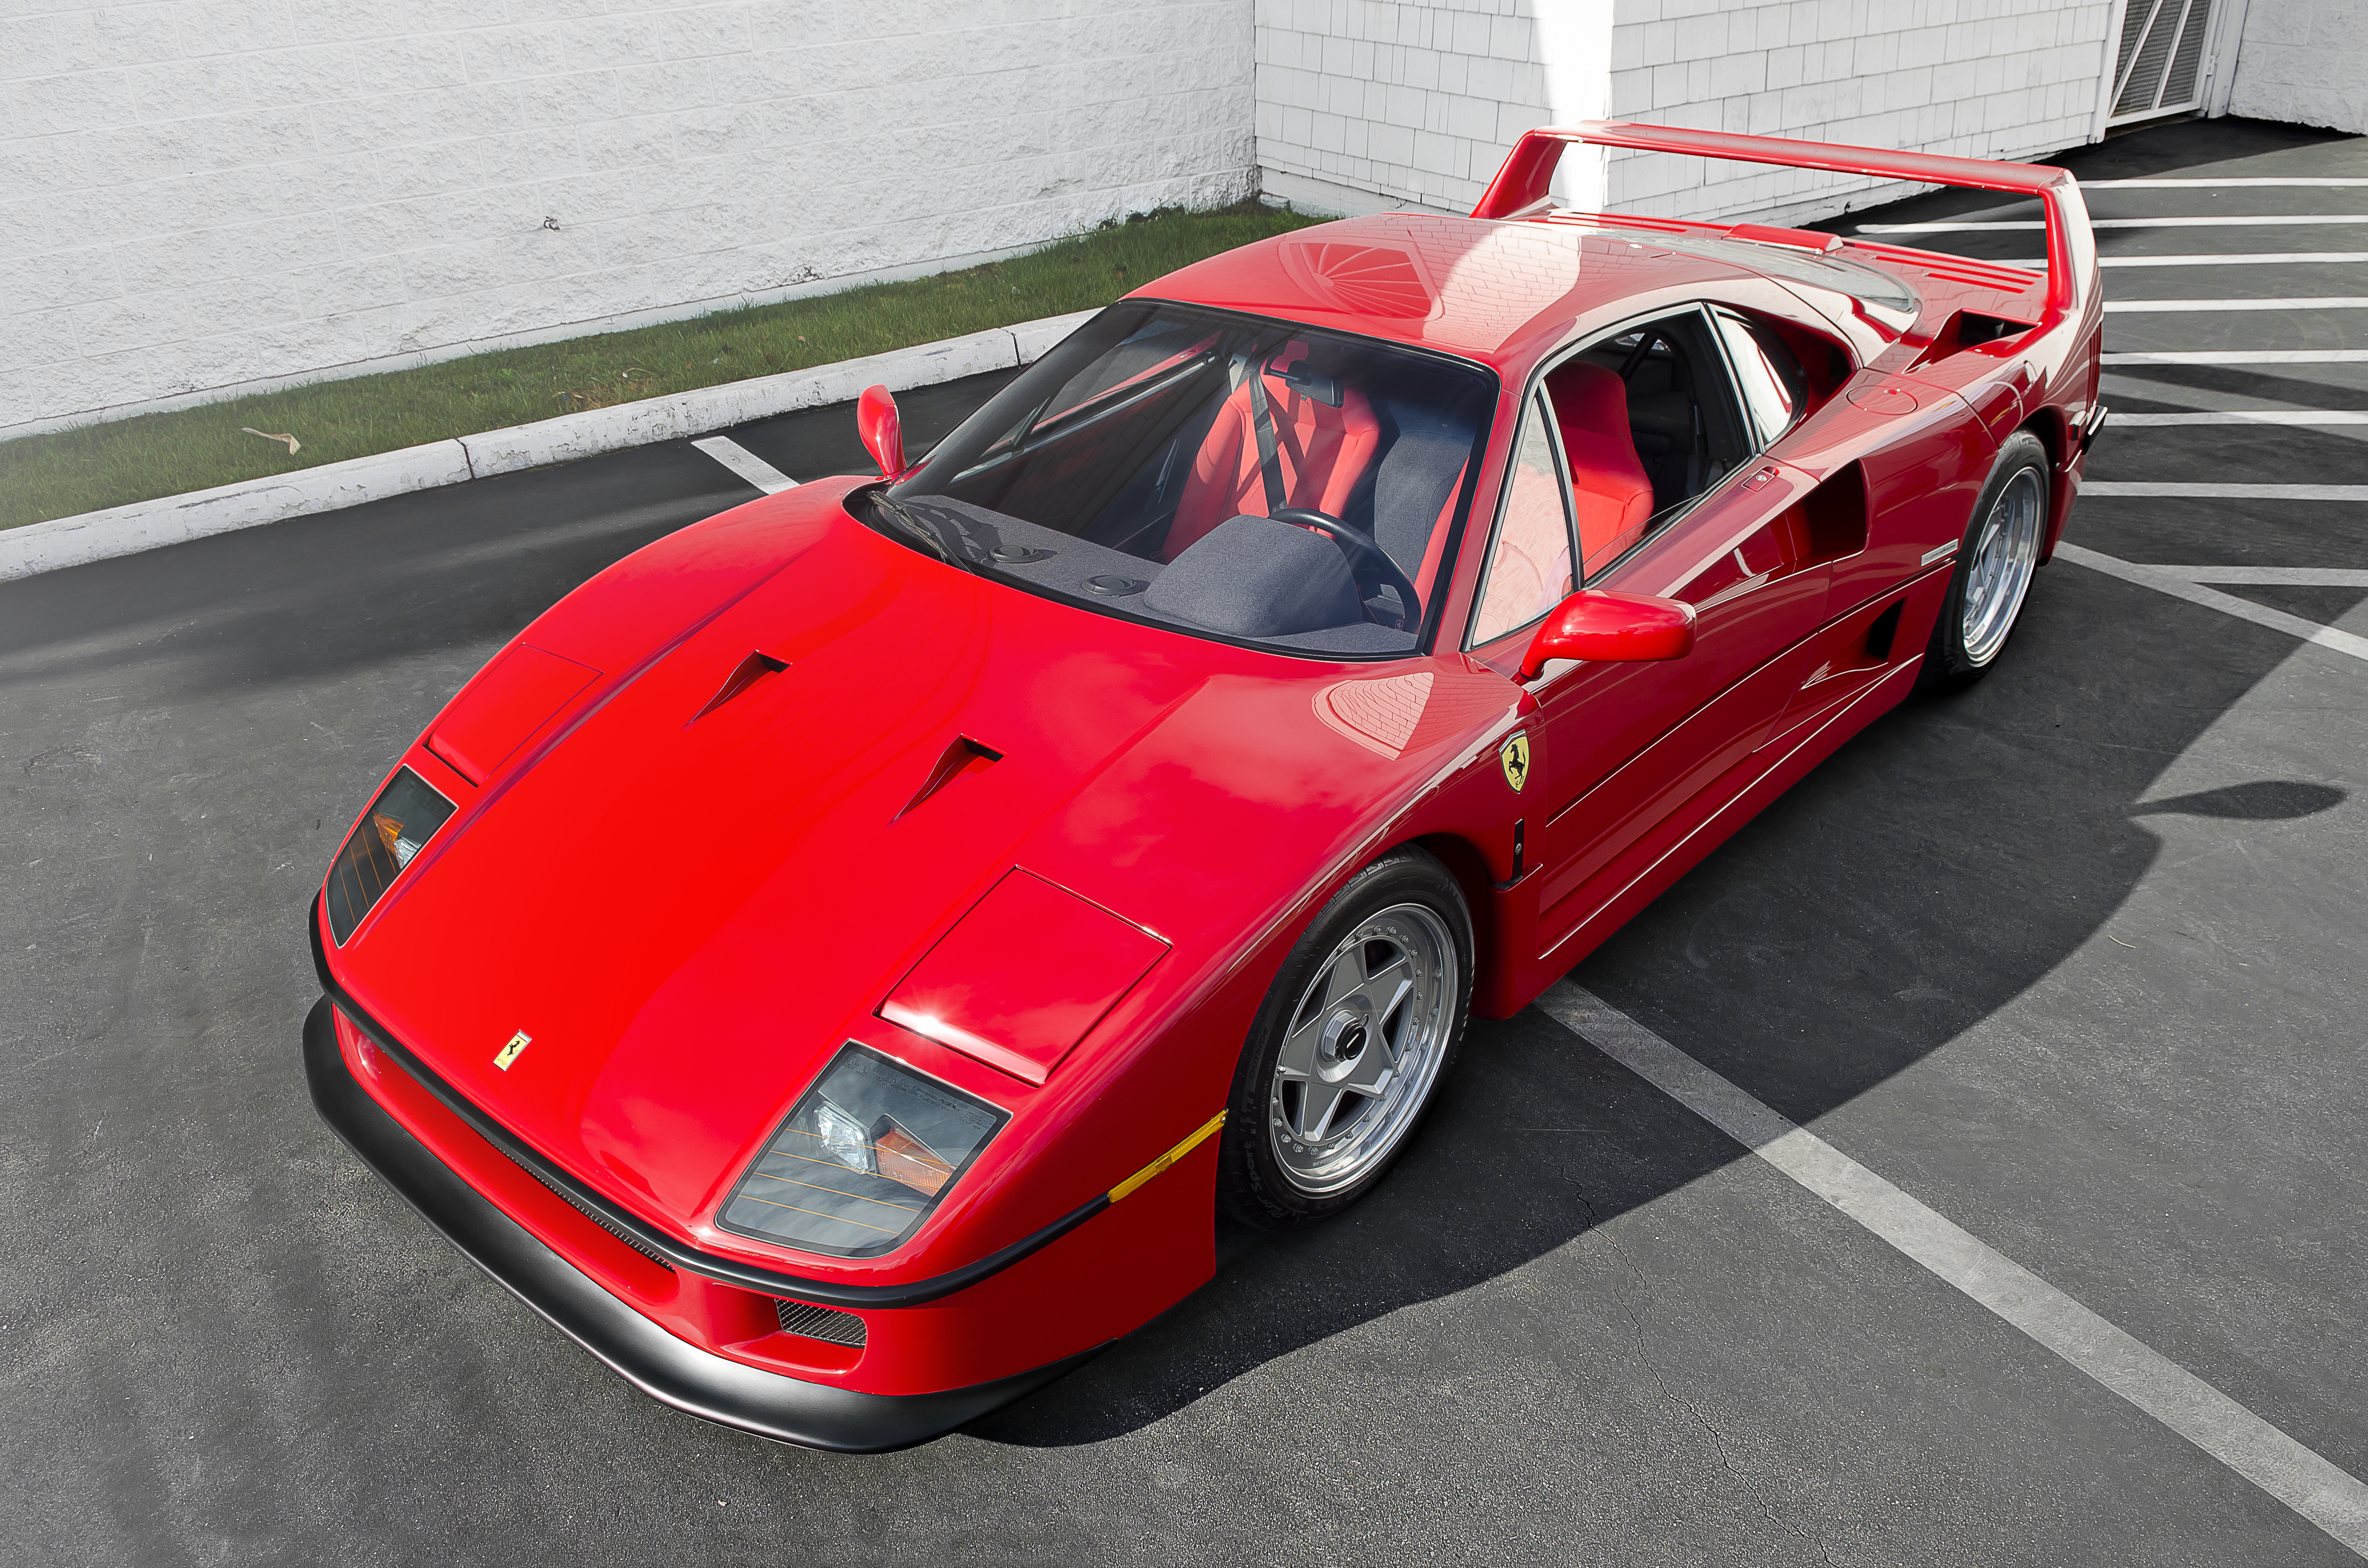 File:Ferrari F40 (14368683508).jpg - Wikimedia Commons